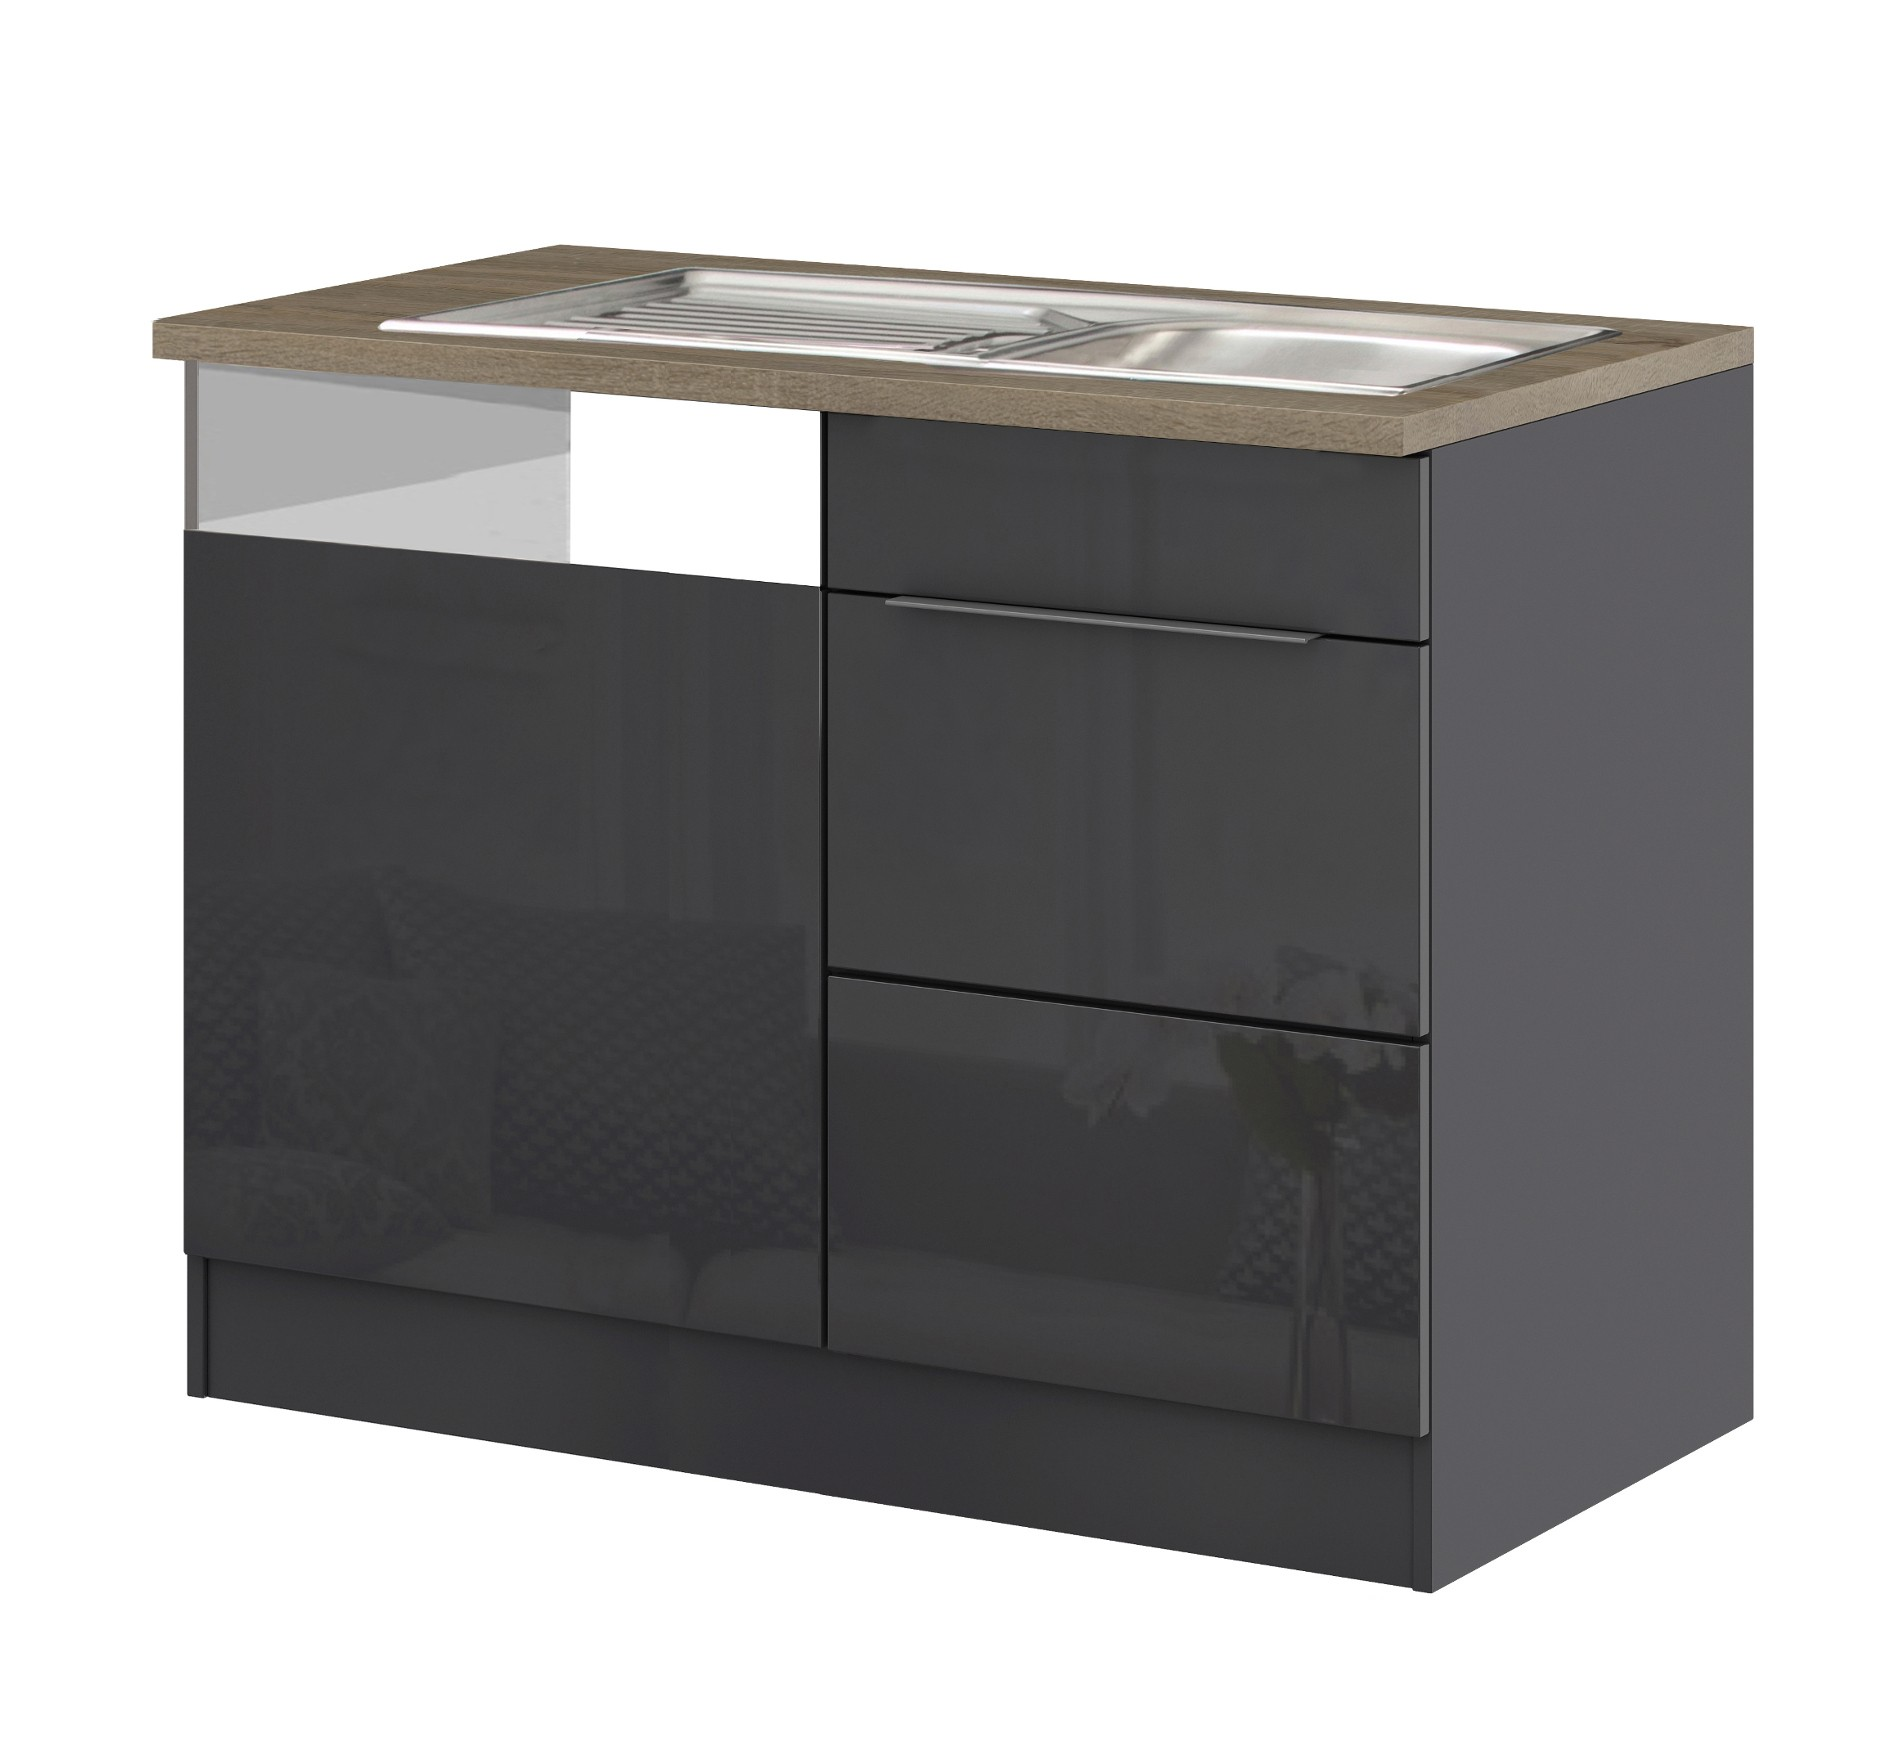 k chen sp lcenter hamburg 1 t rig 110 cm breit. Black Bedroom Furniture Sets. Home Design Ideas